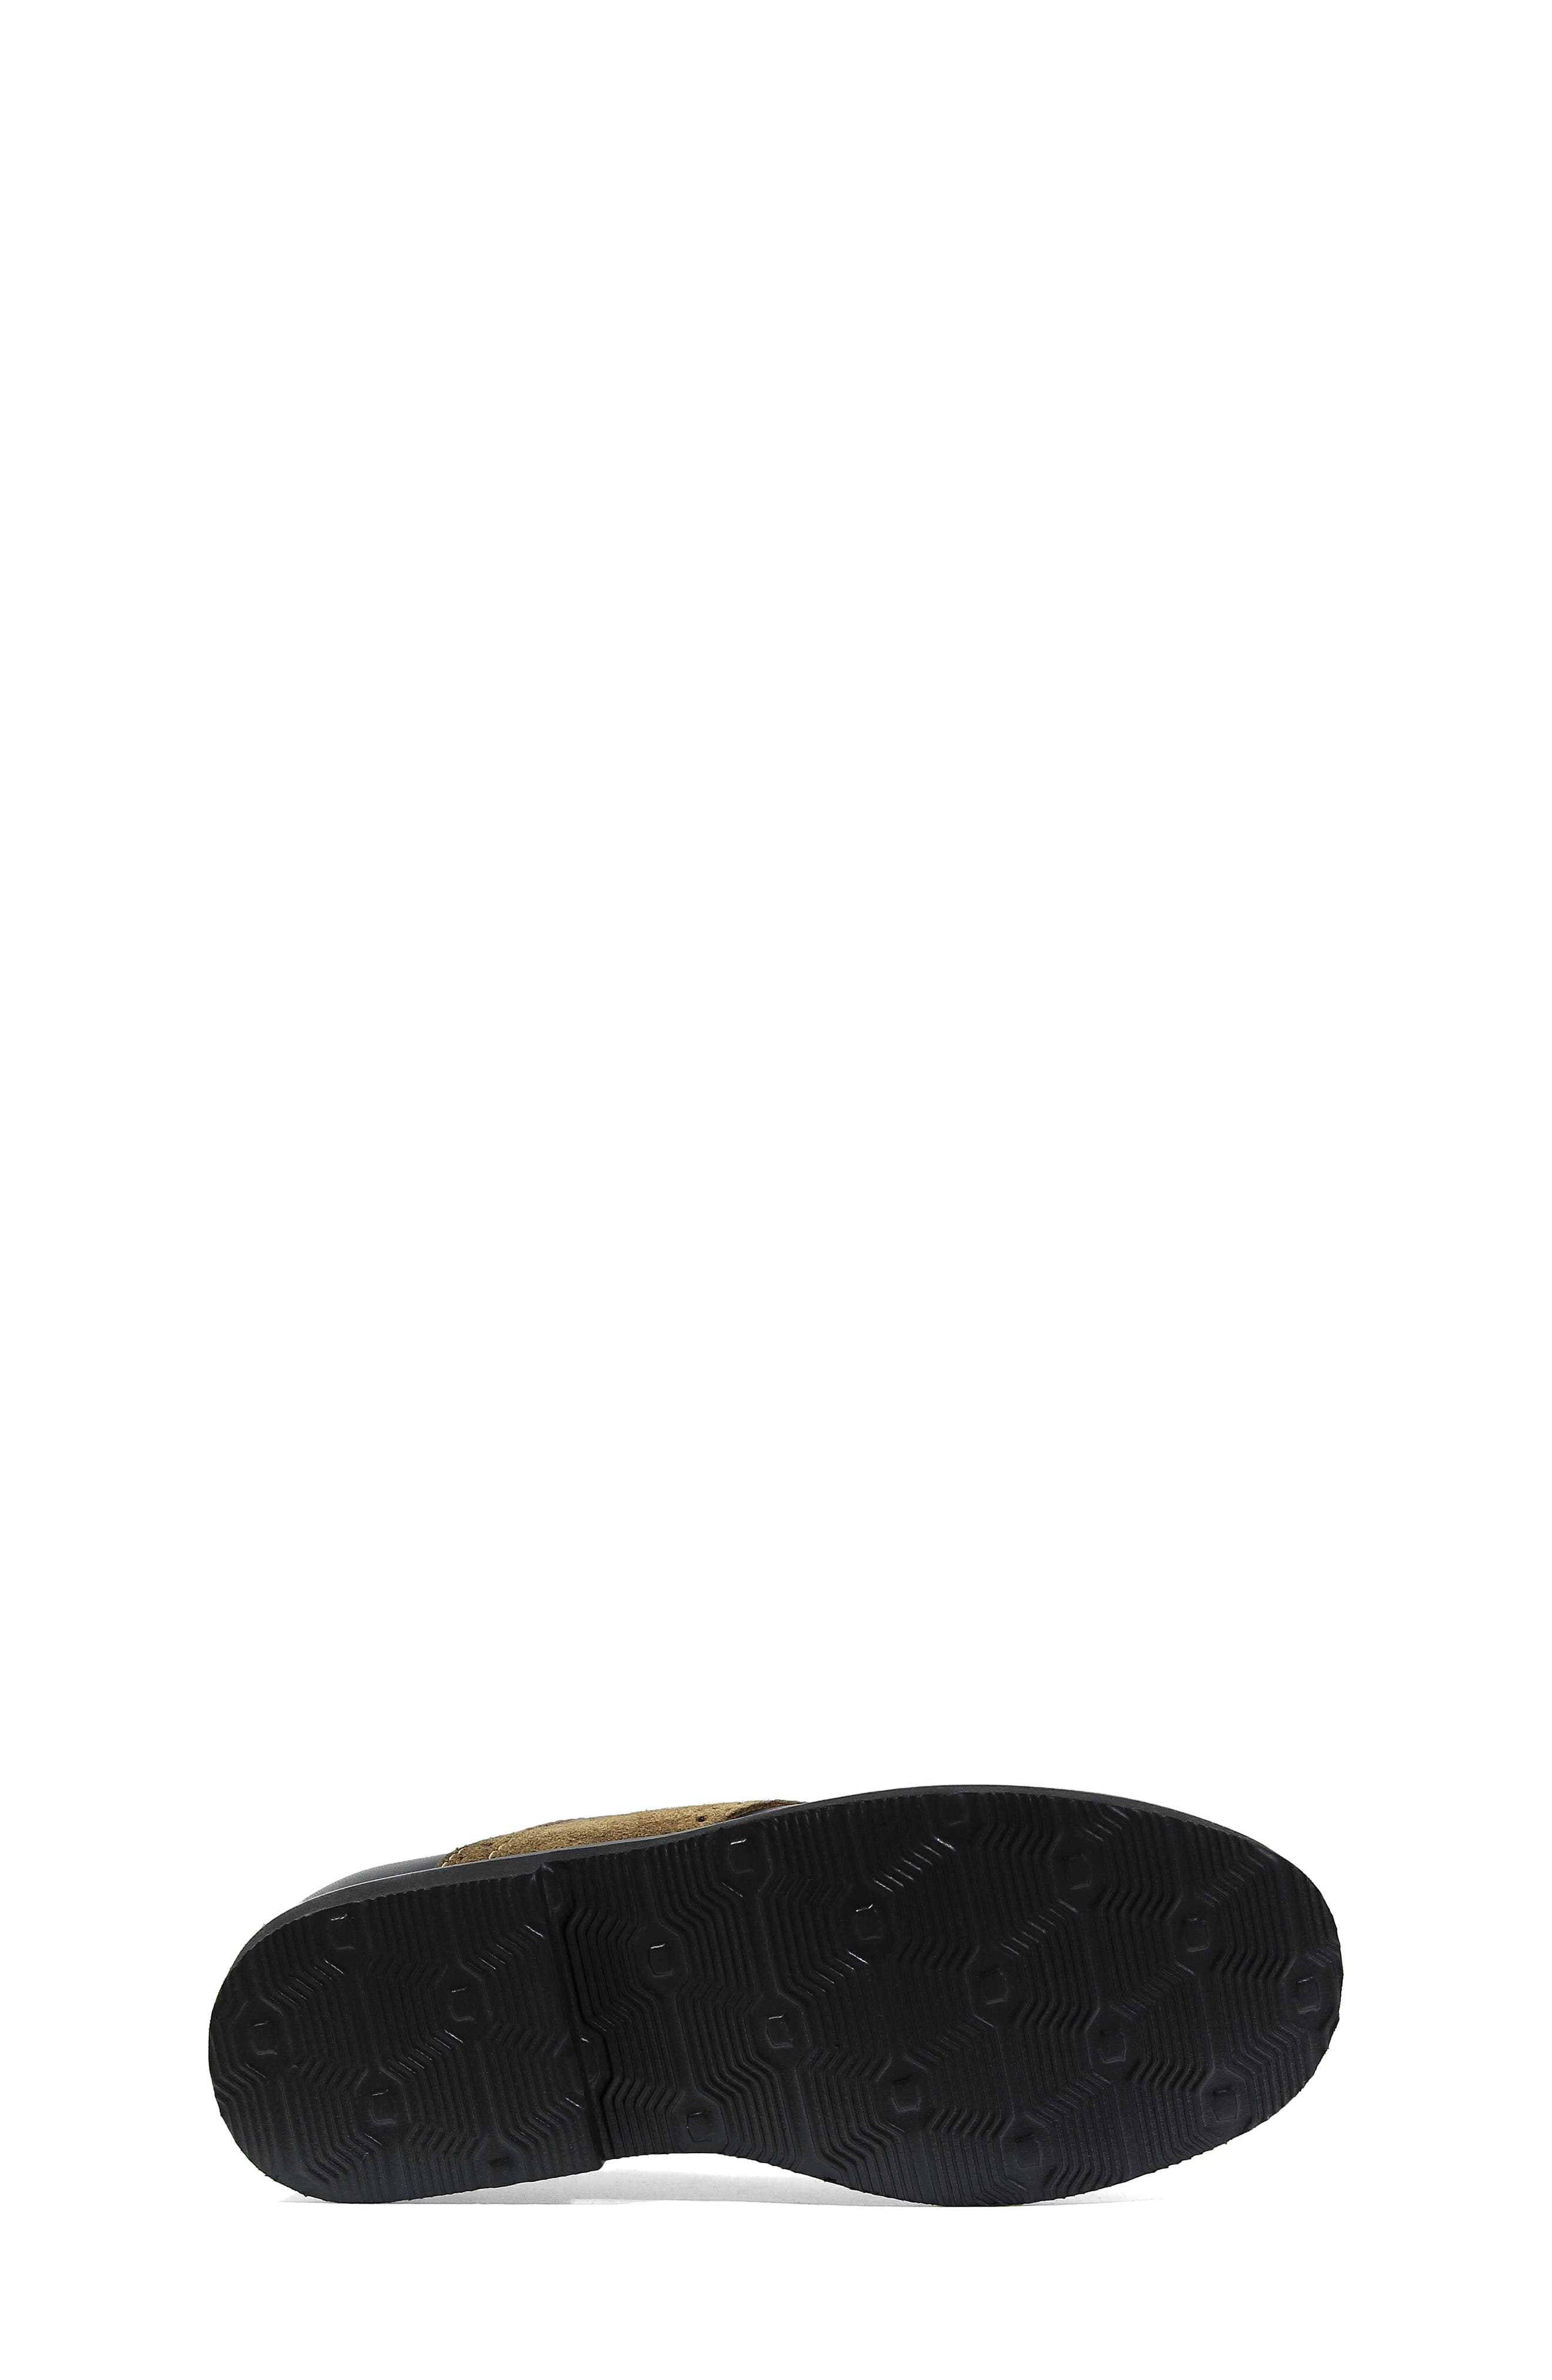 'Kennett Jr. II' Saddle Shoe,                             Alternate thumbnail 5, color,                             SMOOTH BLACK W/ MOCHA SUEDE